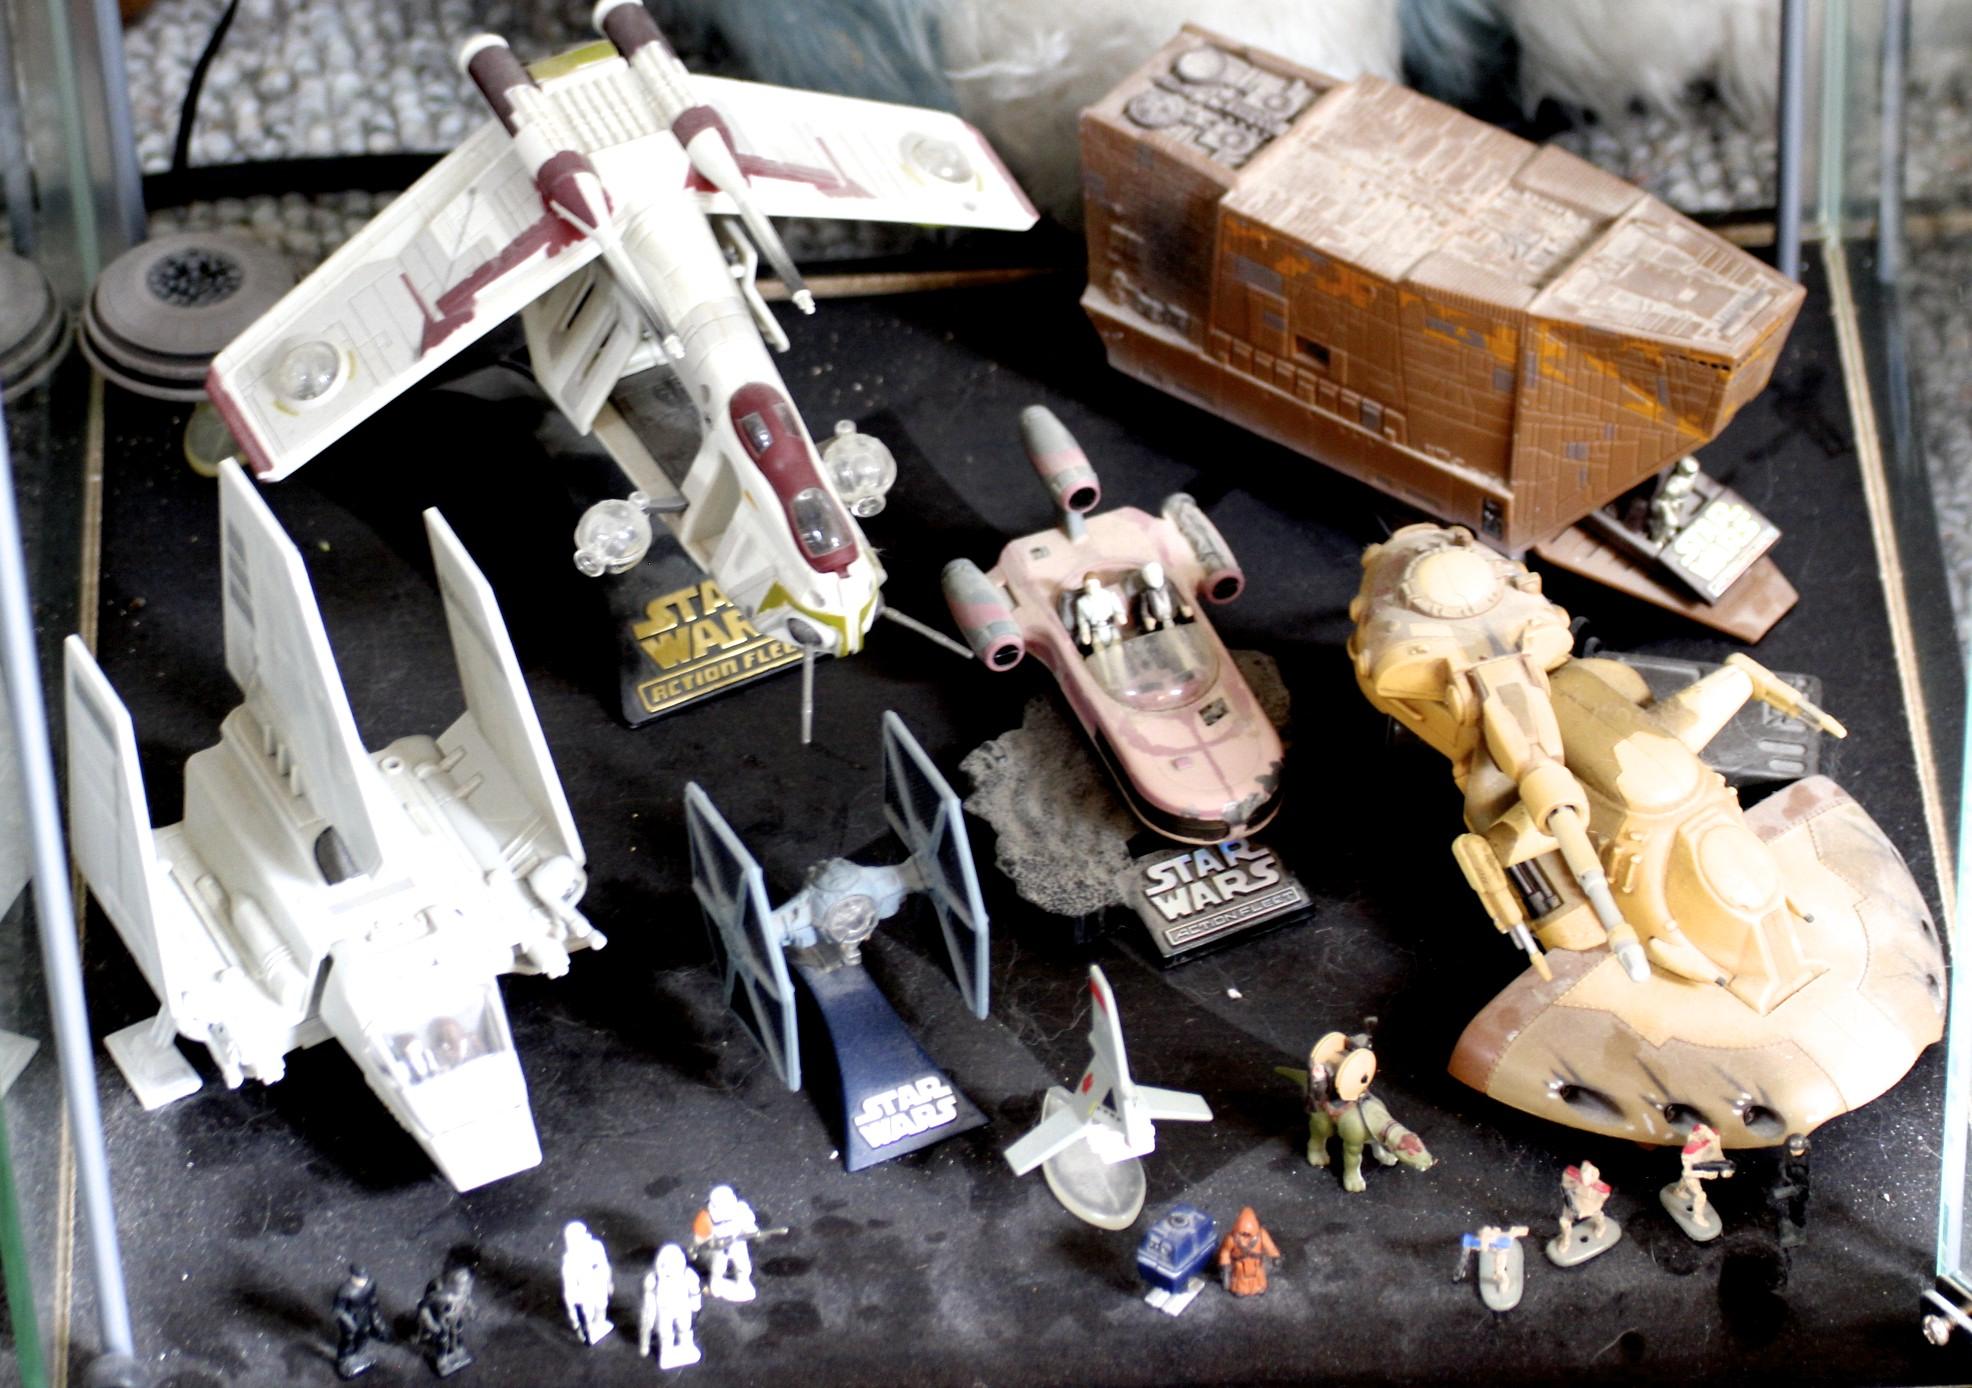 Imperial Shuttle, Replublic Gunship, Jawa Sand Crawler, TIE Fighter, Land Speeder, Doird Battletank, etc.